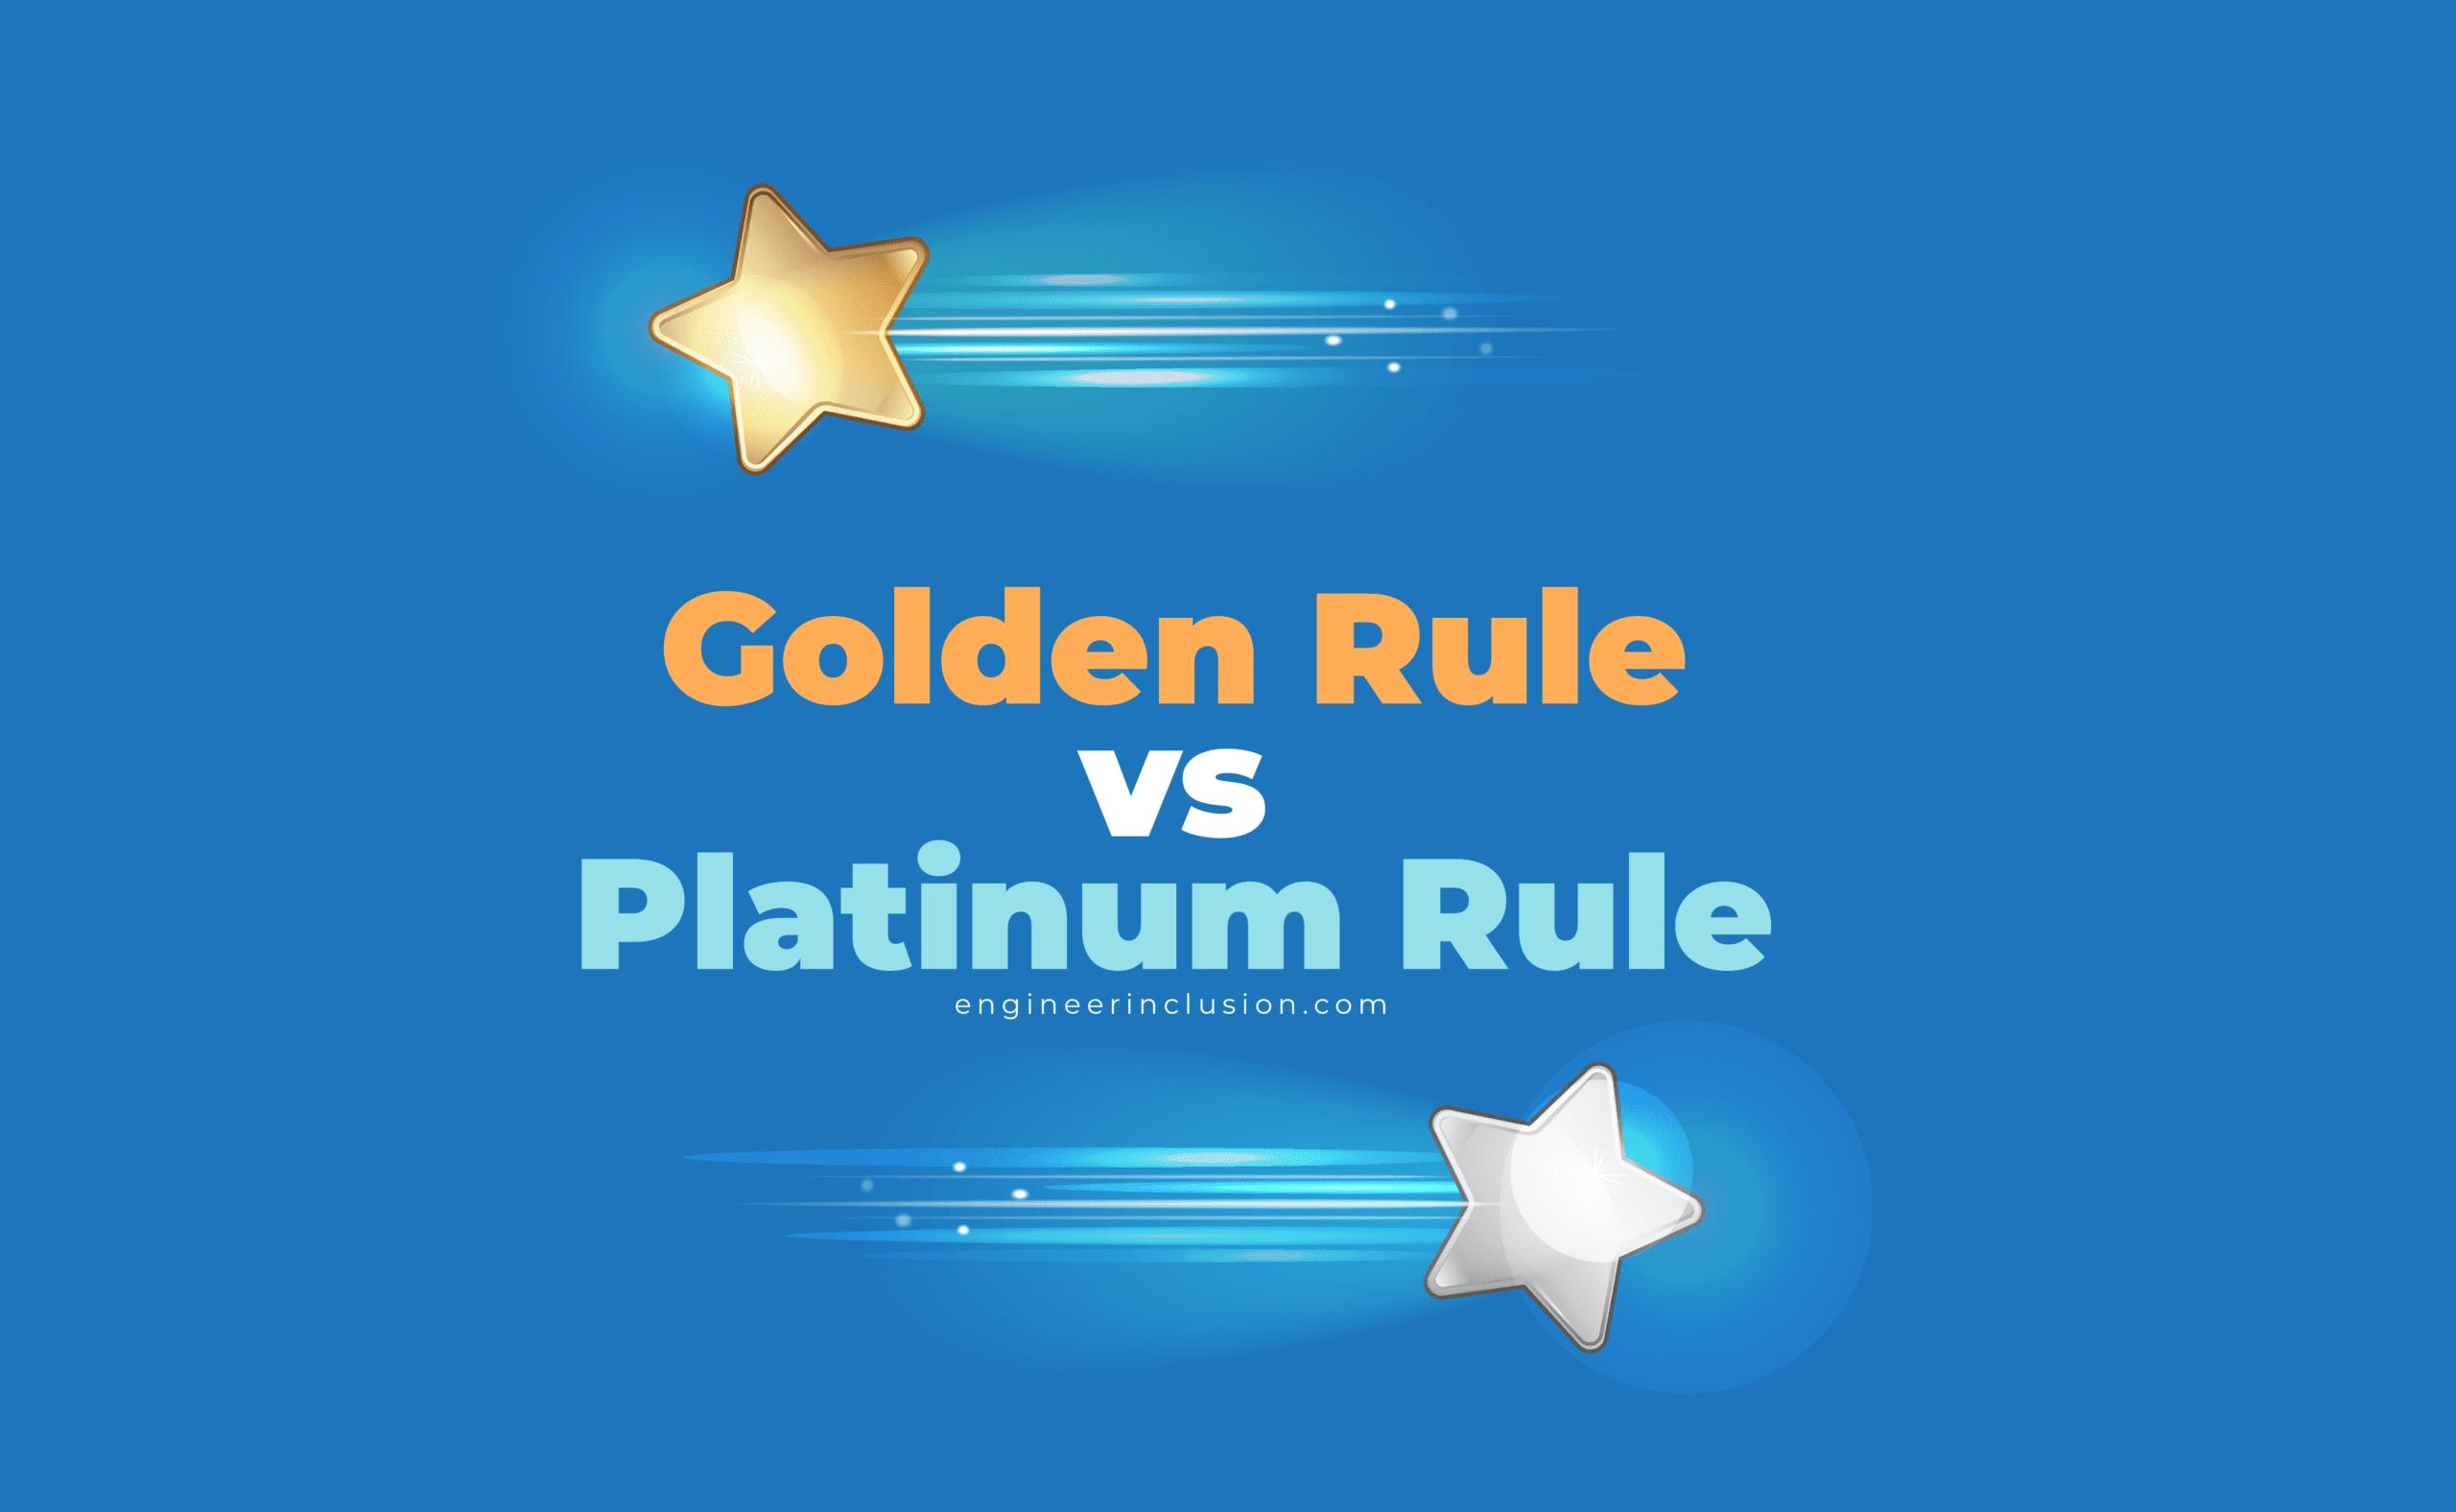 golden rule vs platinum rule